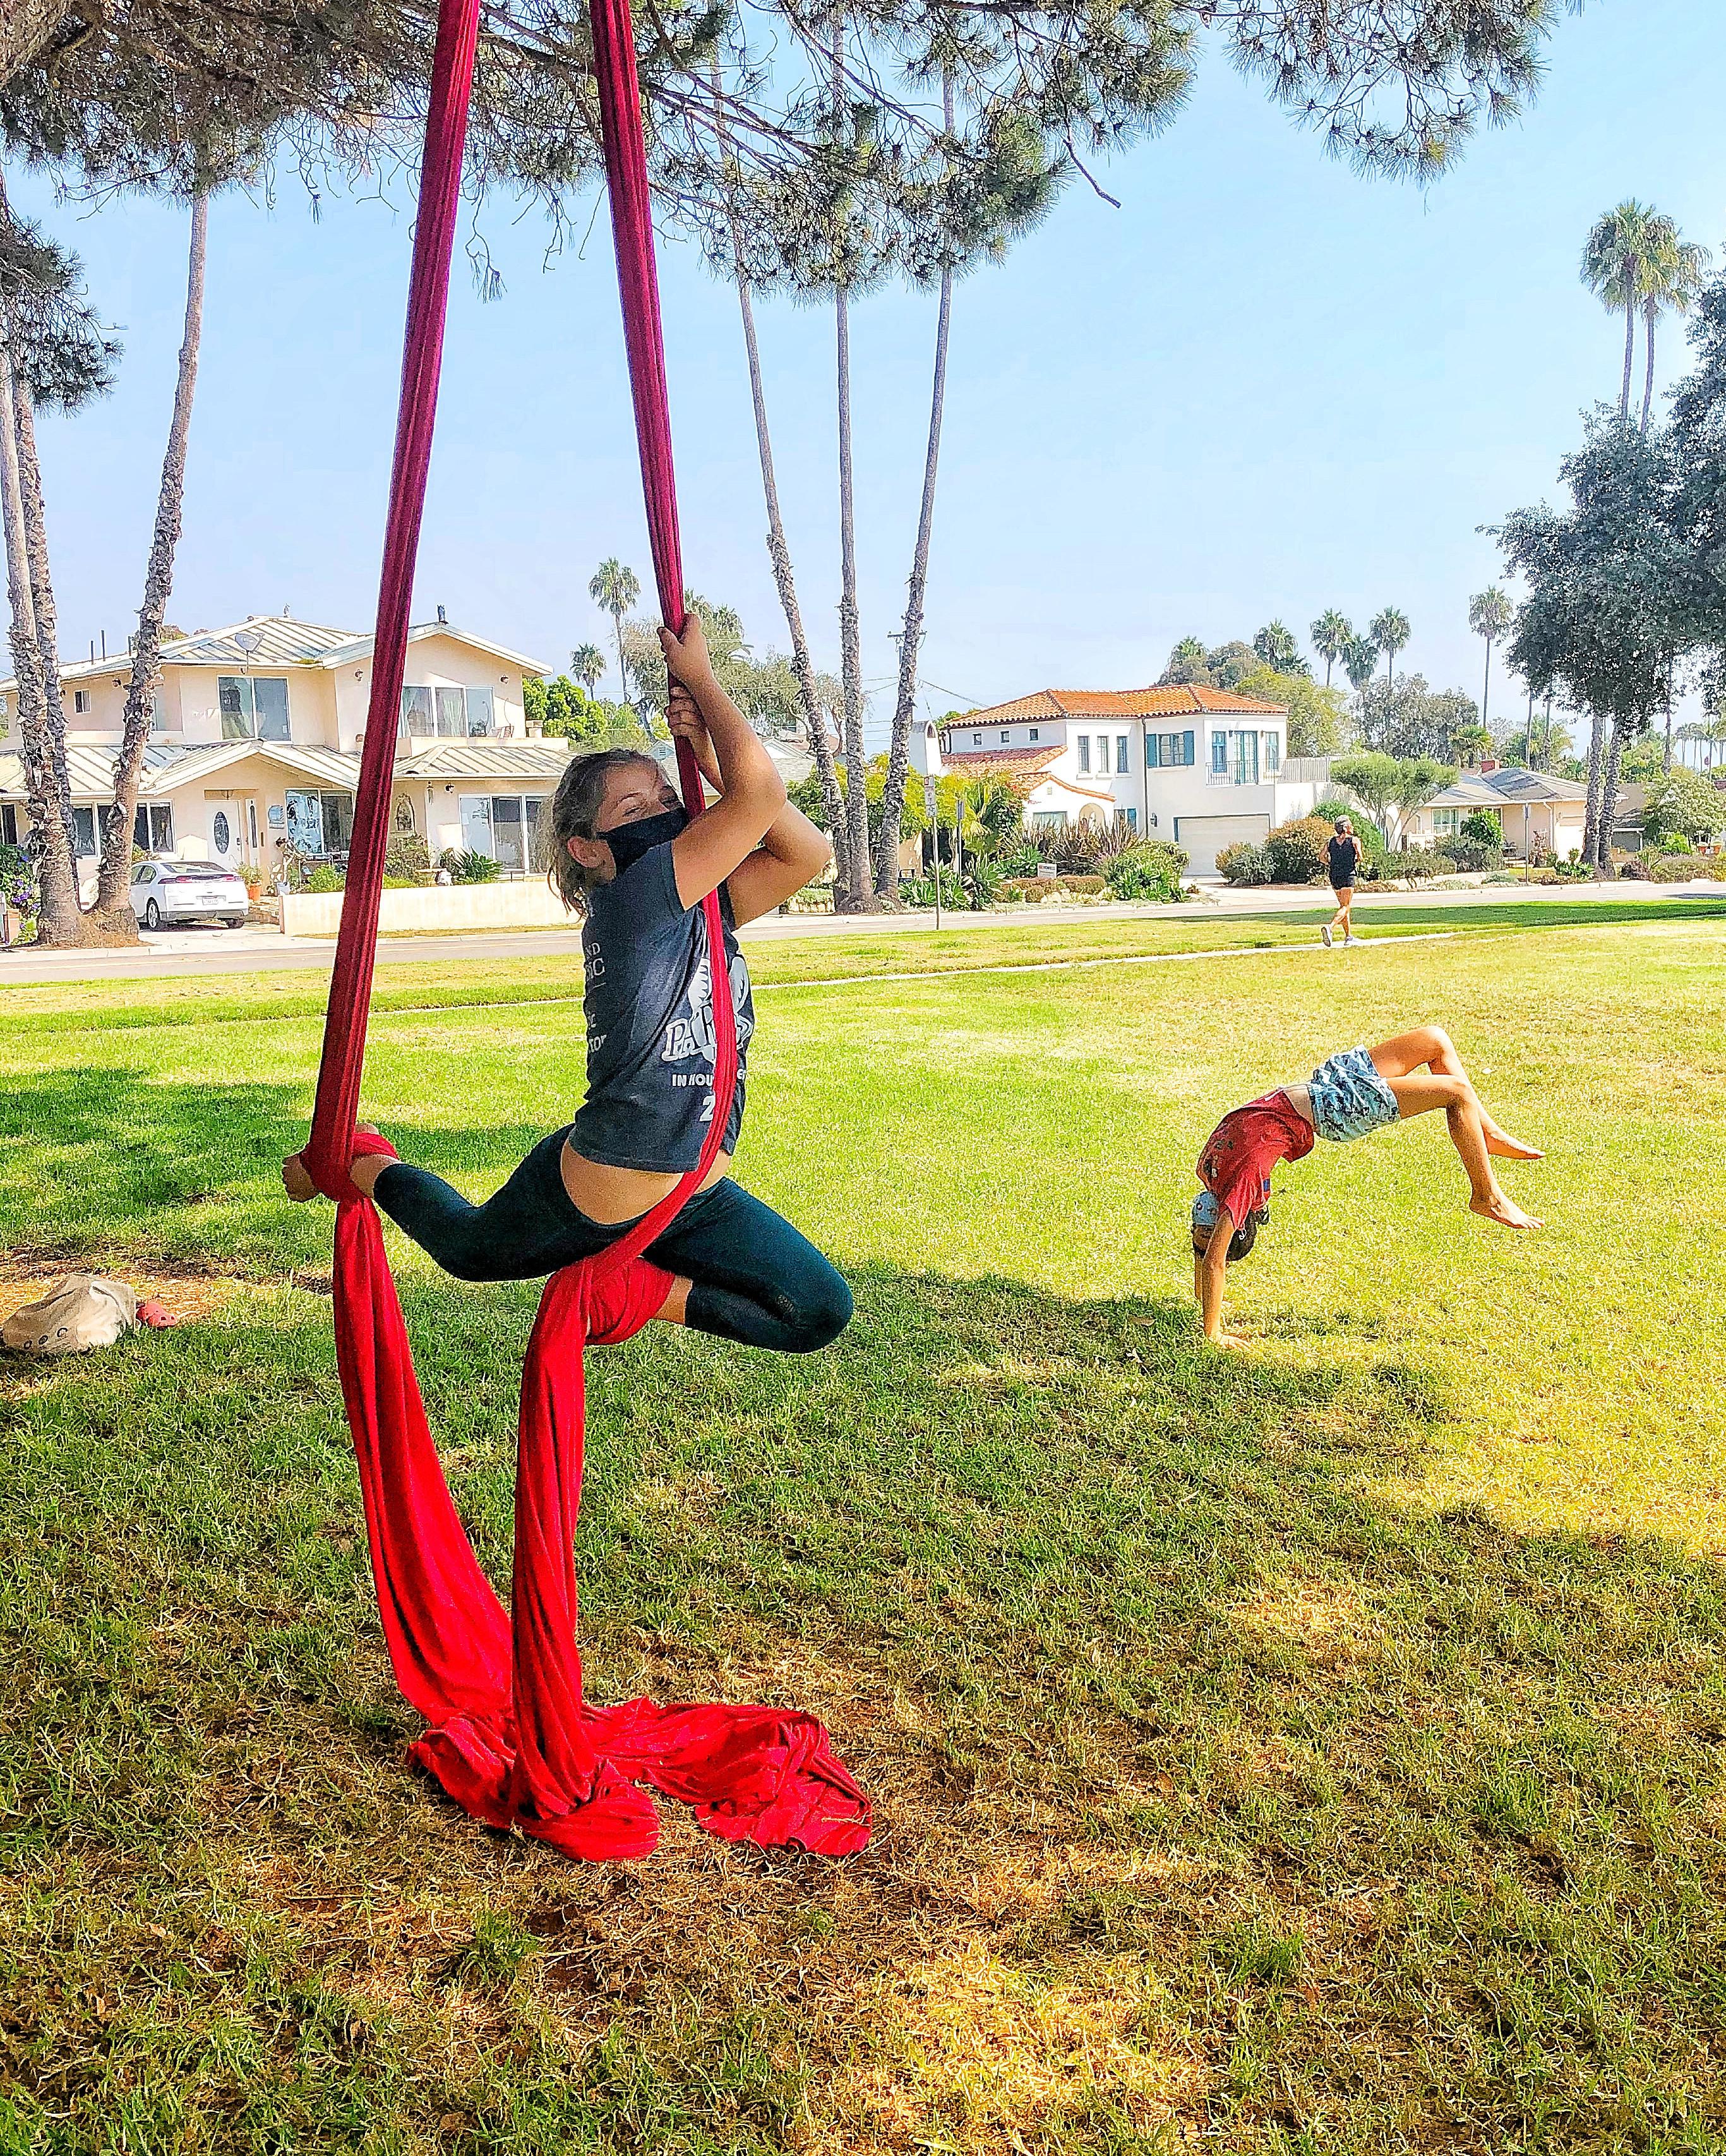 Circus Arts Camp ages 6-13